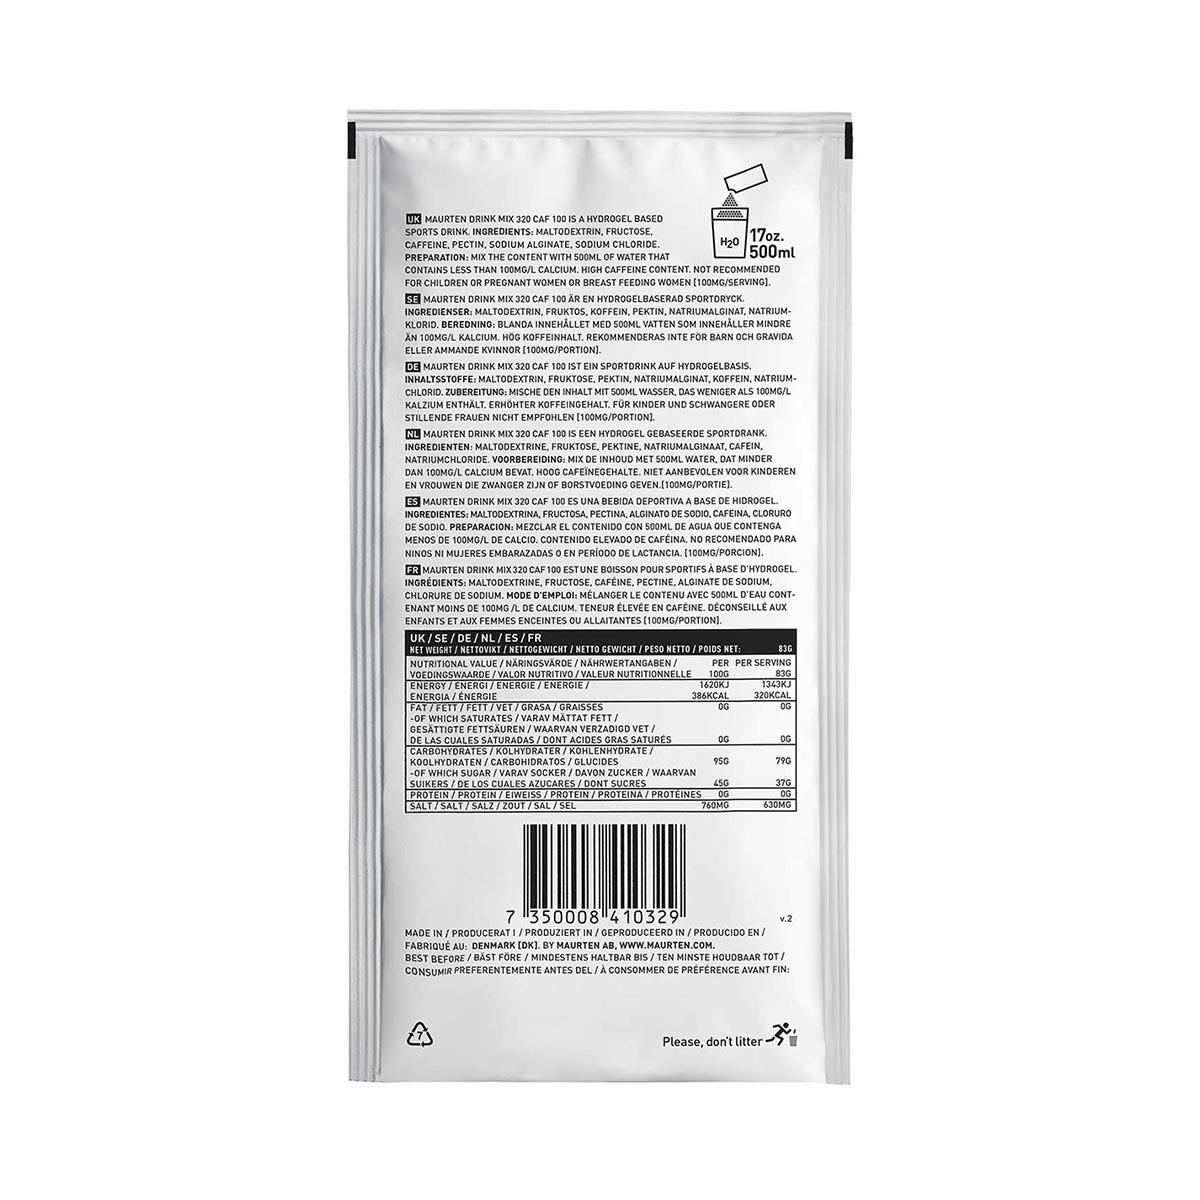 MAURTEN - DRINK MIX 320 CAF (100 MG CAFFEINE)